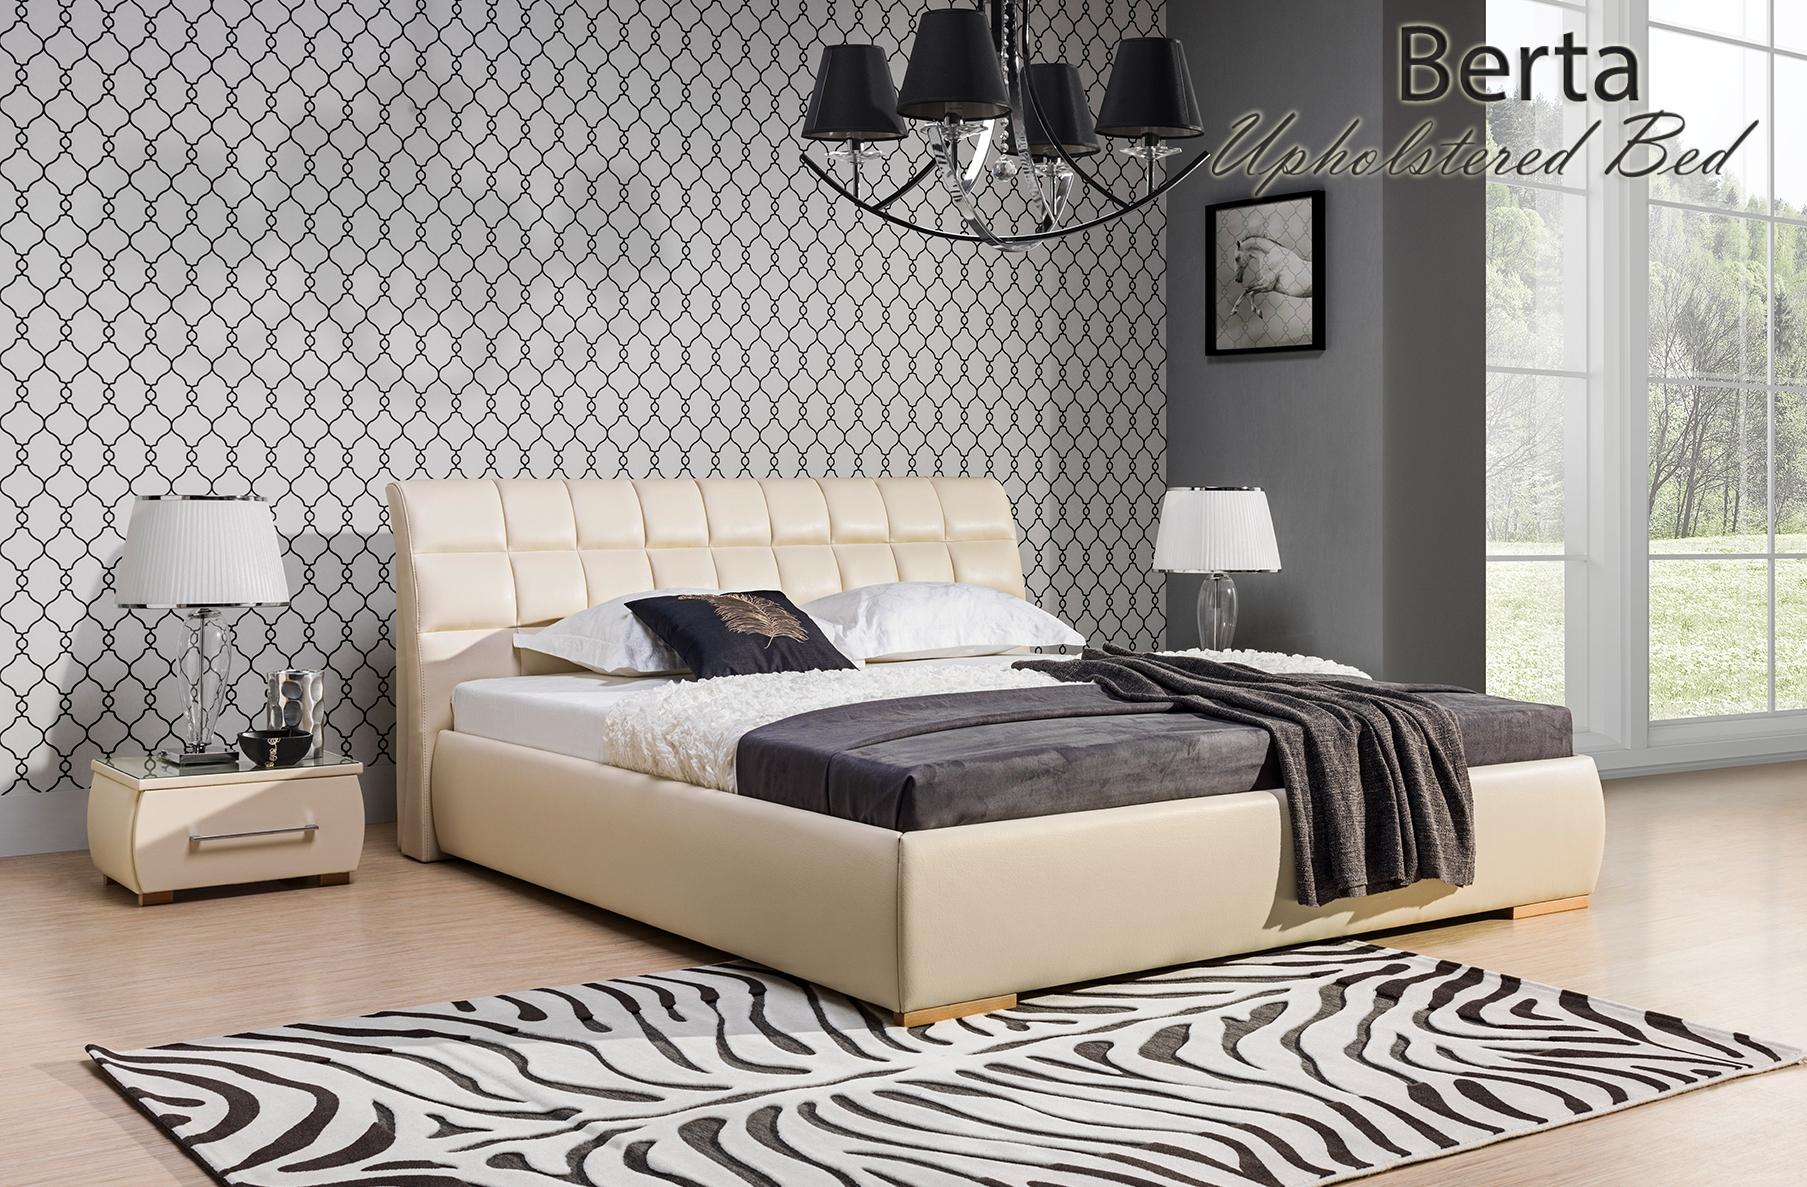 Berta Upholstered Bed, Cheap